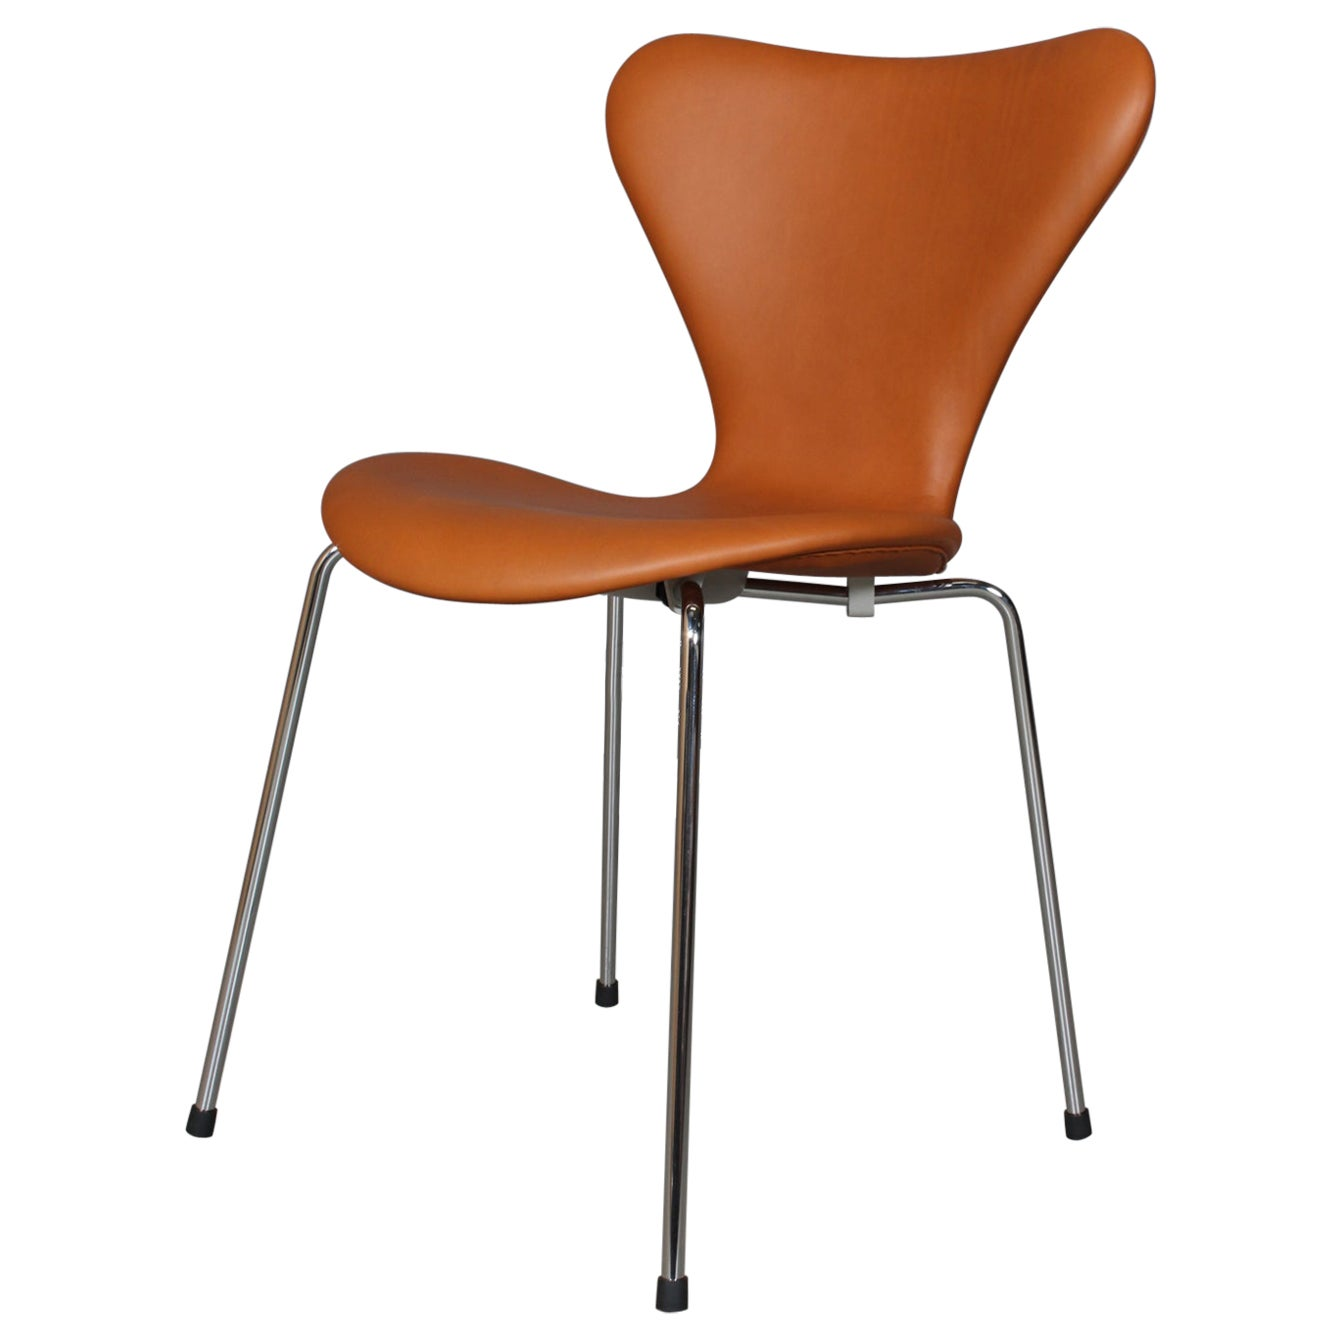 Arne Jacobsen Dining Chair